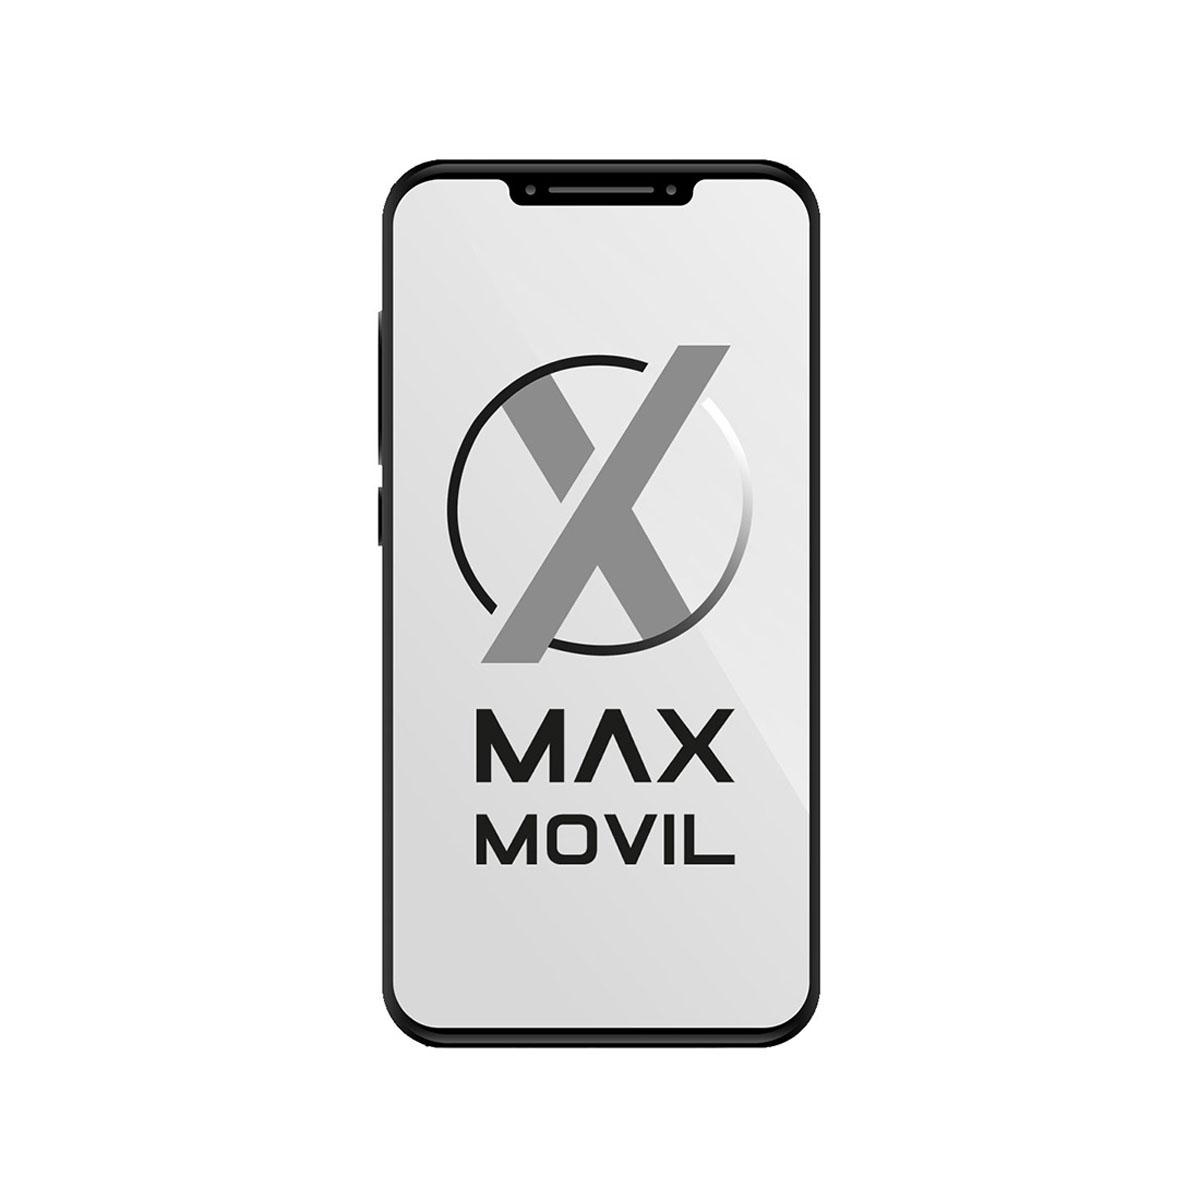 Samsung Galaxy Note 10.1 N8020 gris libre